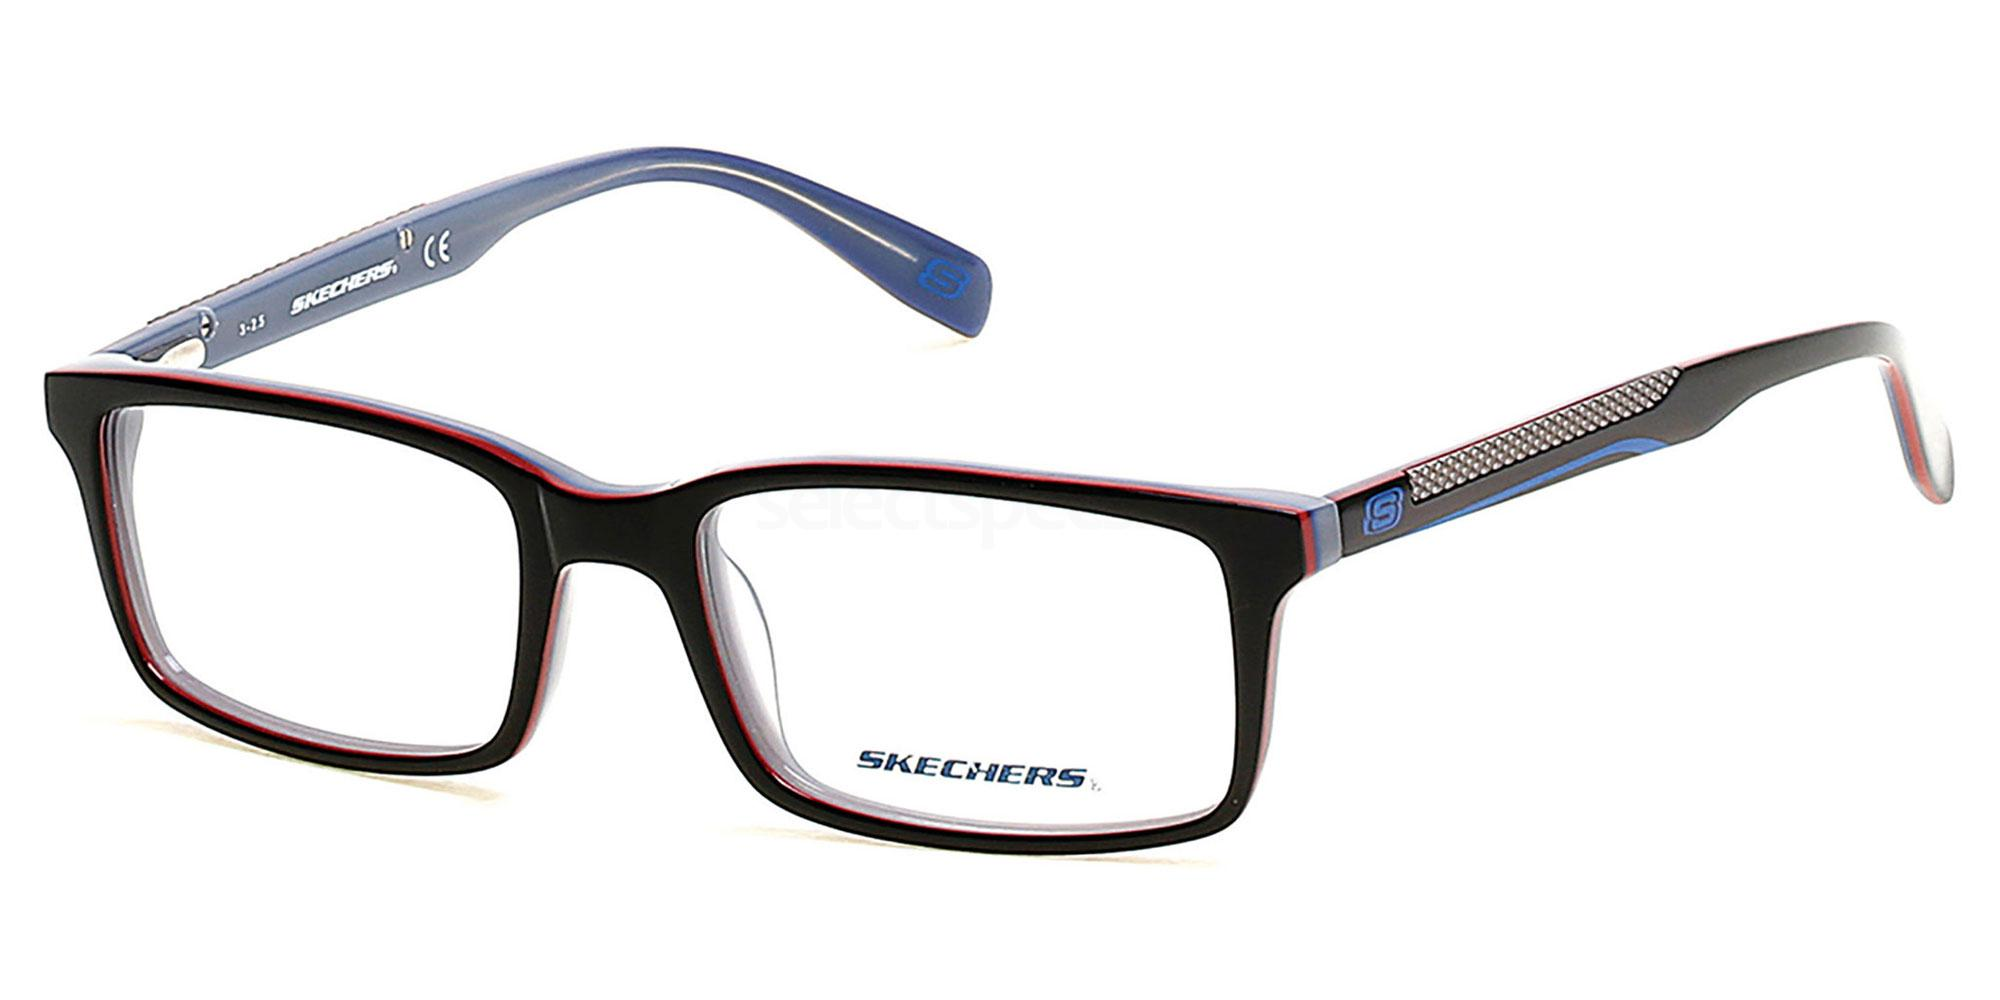 5cef1d183b72 Skechers SE3182 glasses. Free lenses & delivery   SelectSpecs Australia